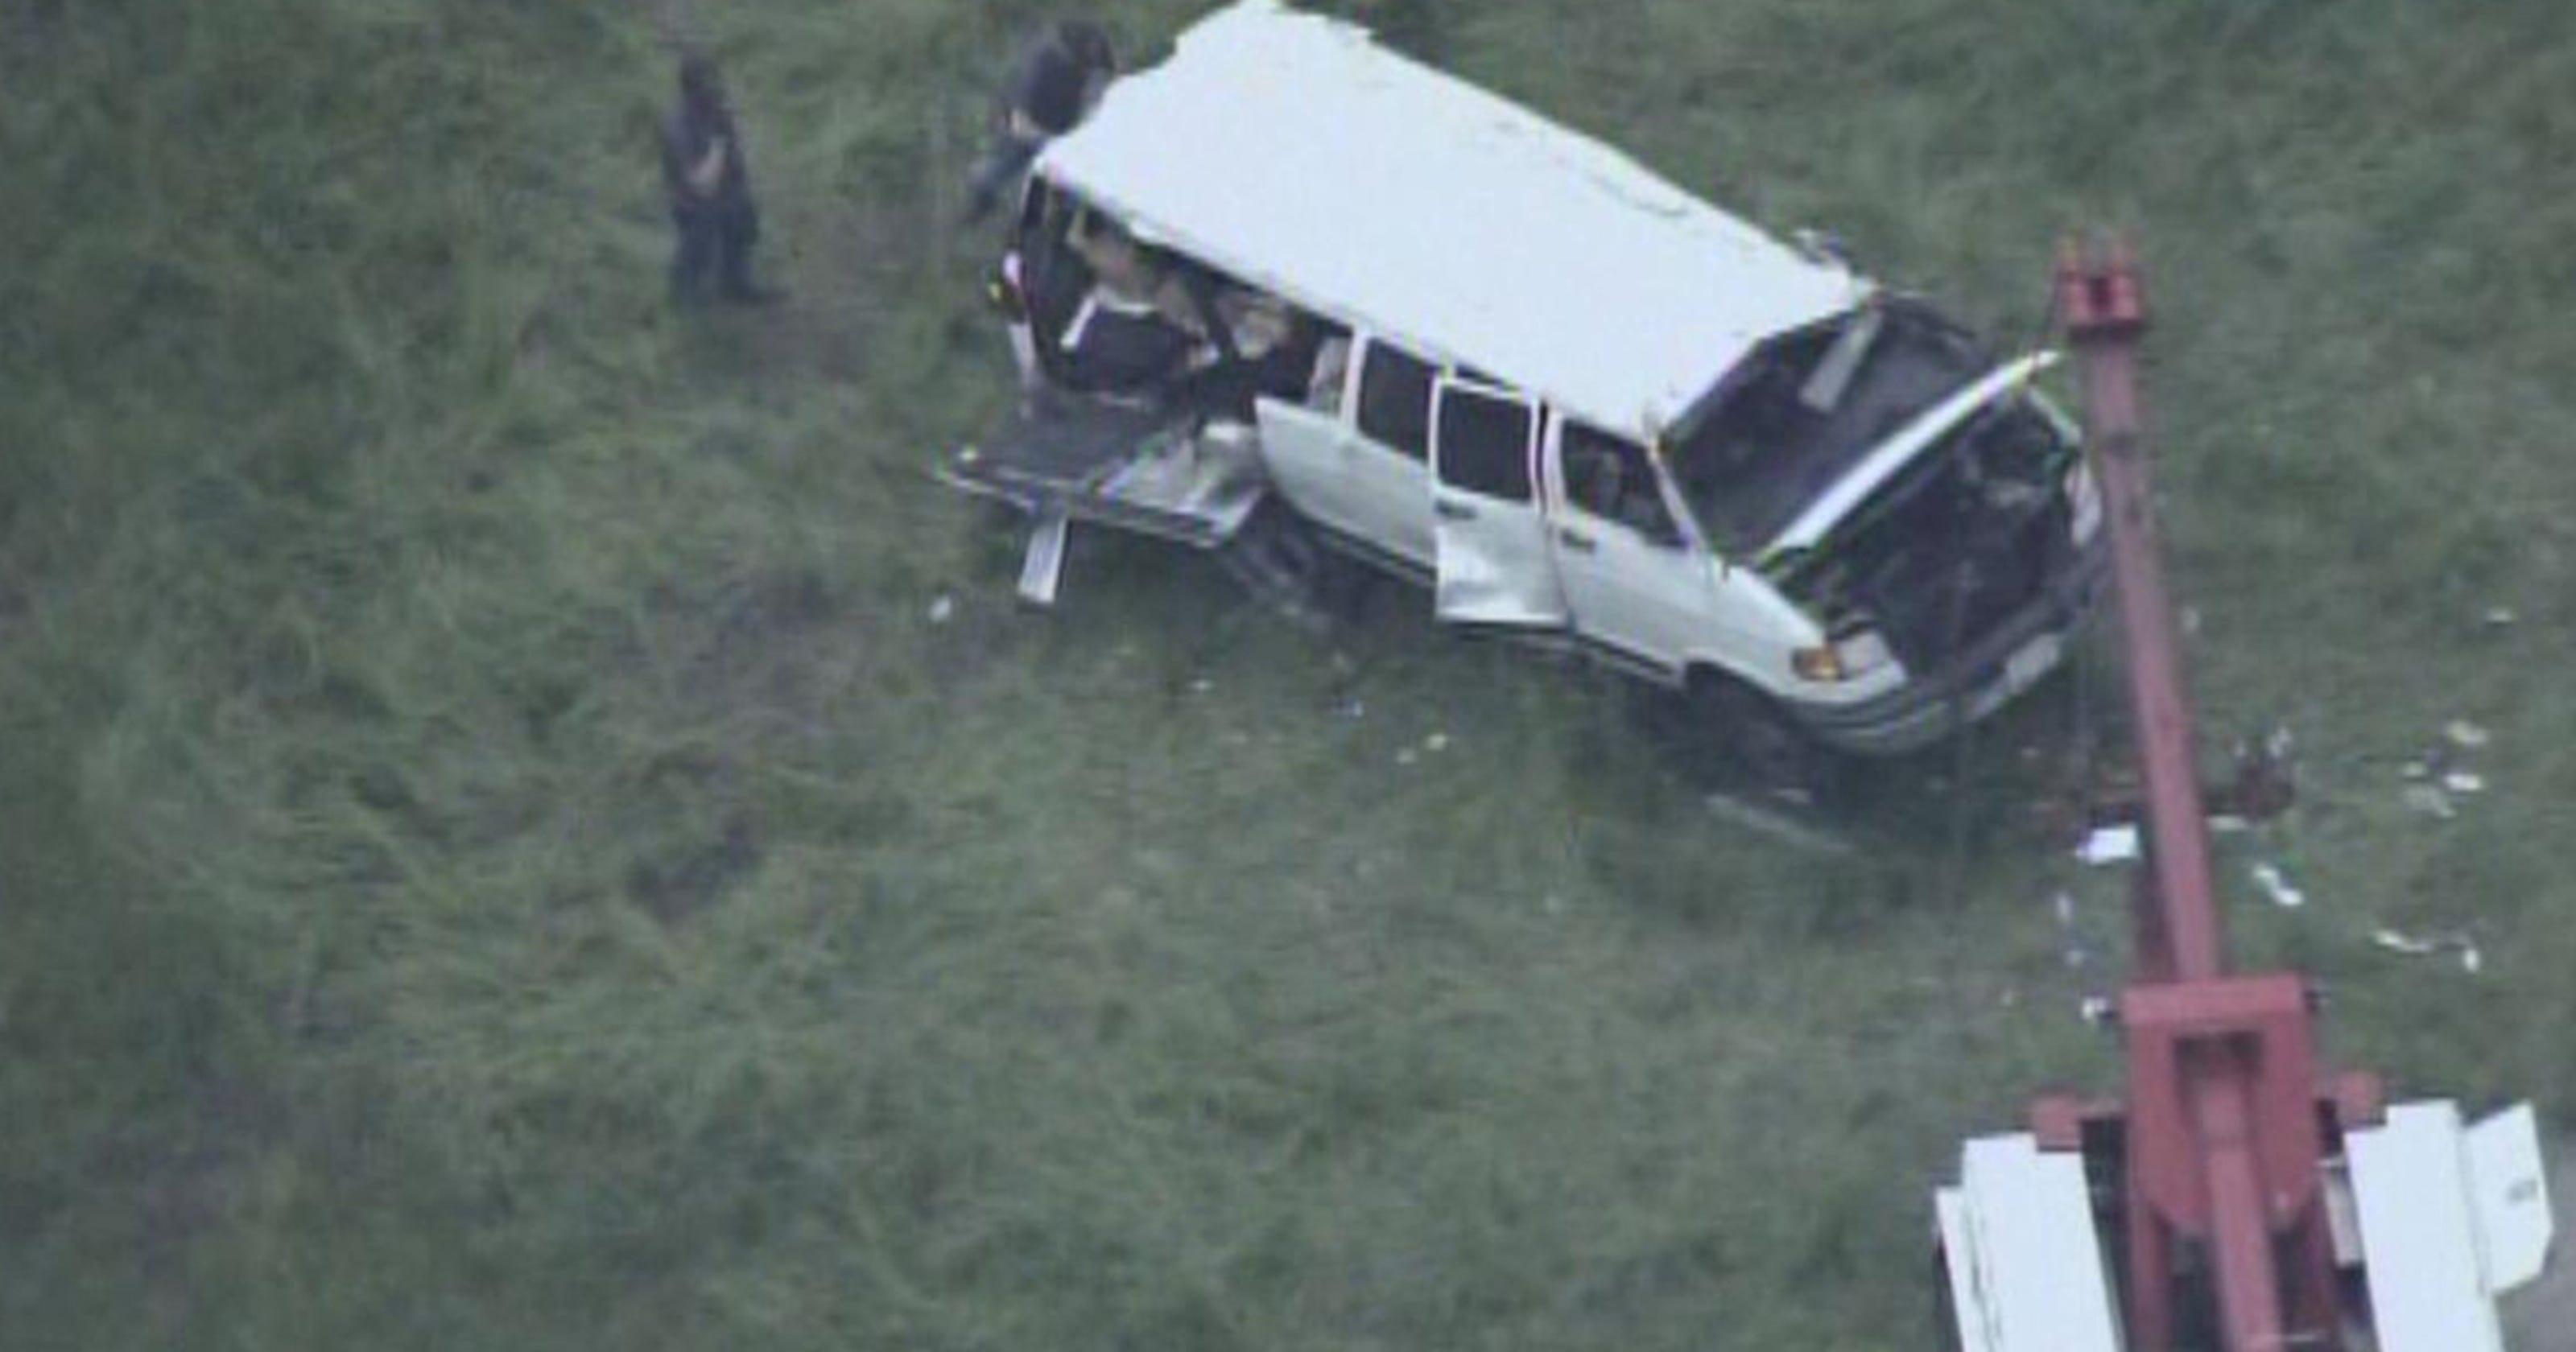 5 dead in church van crash in Illinois